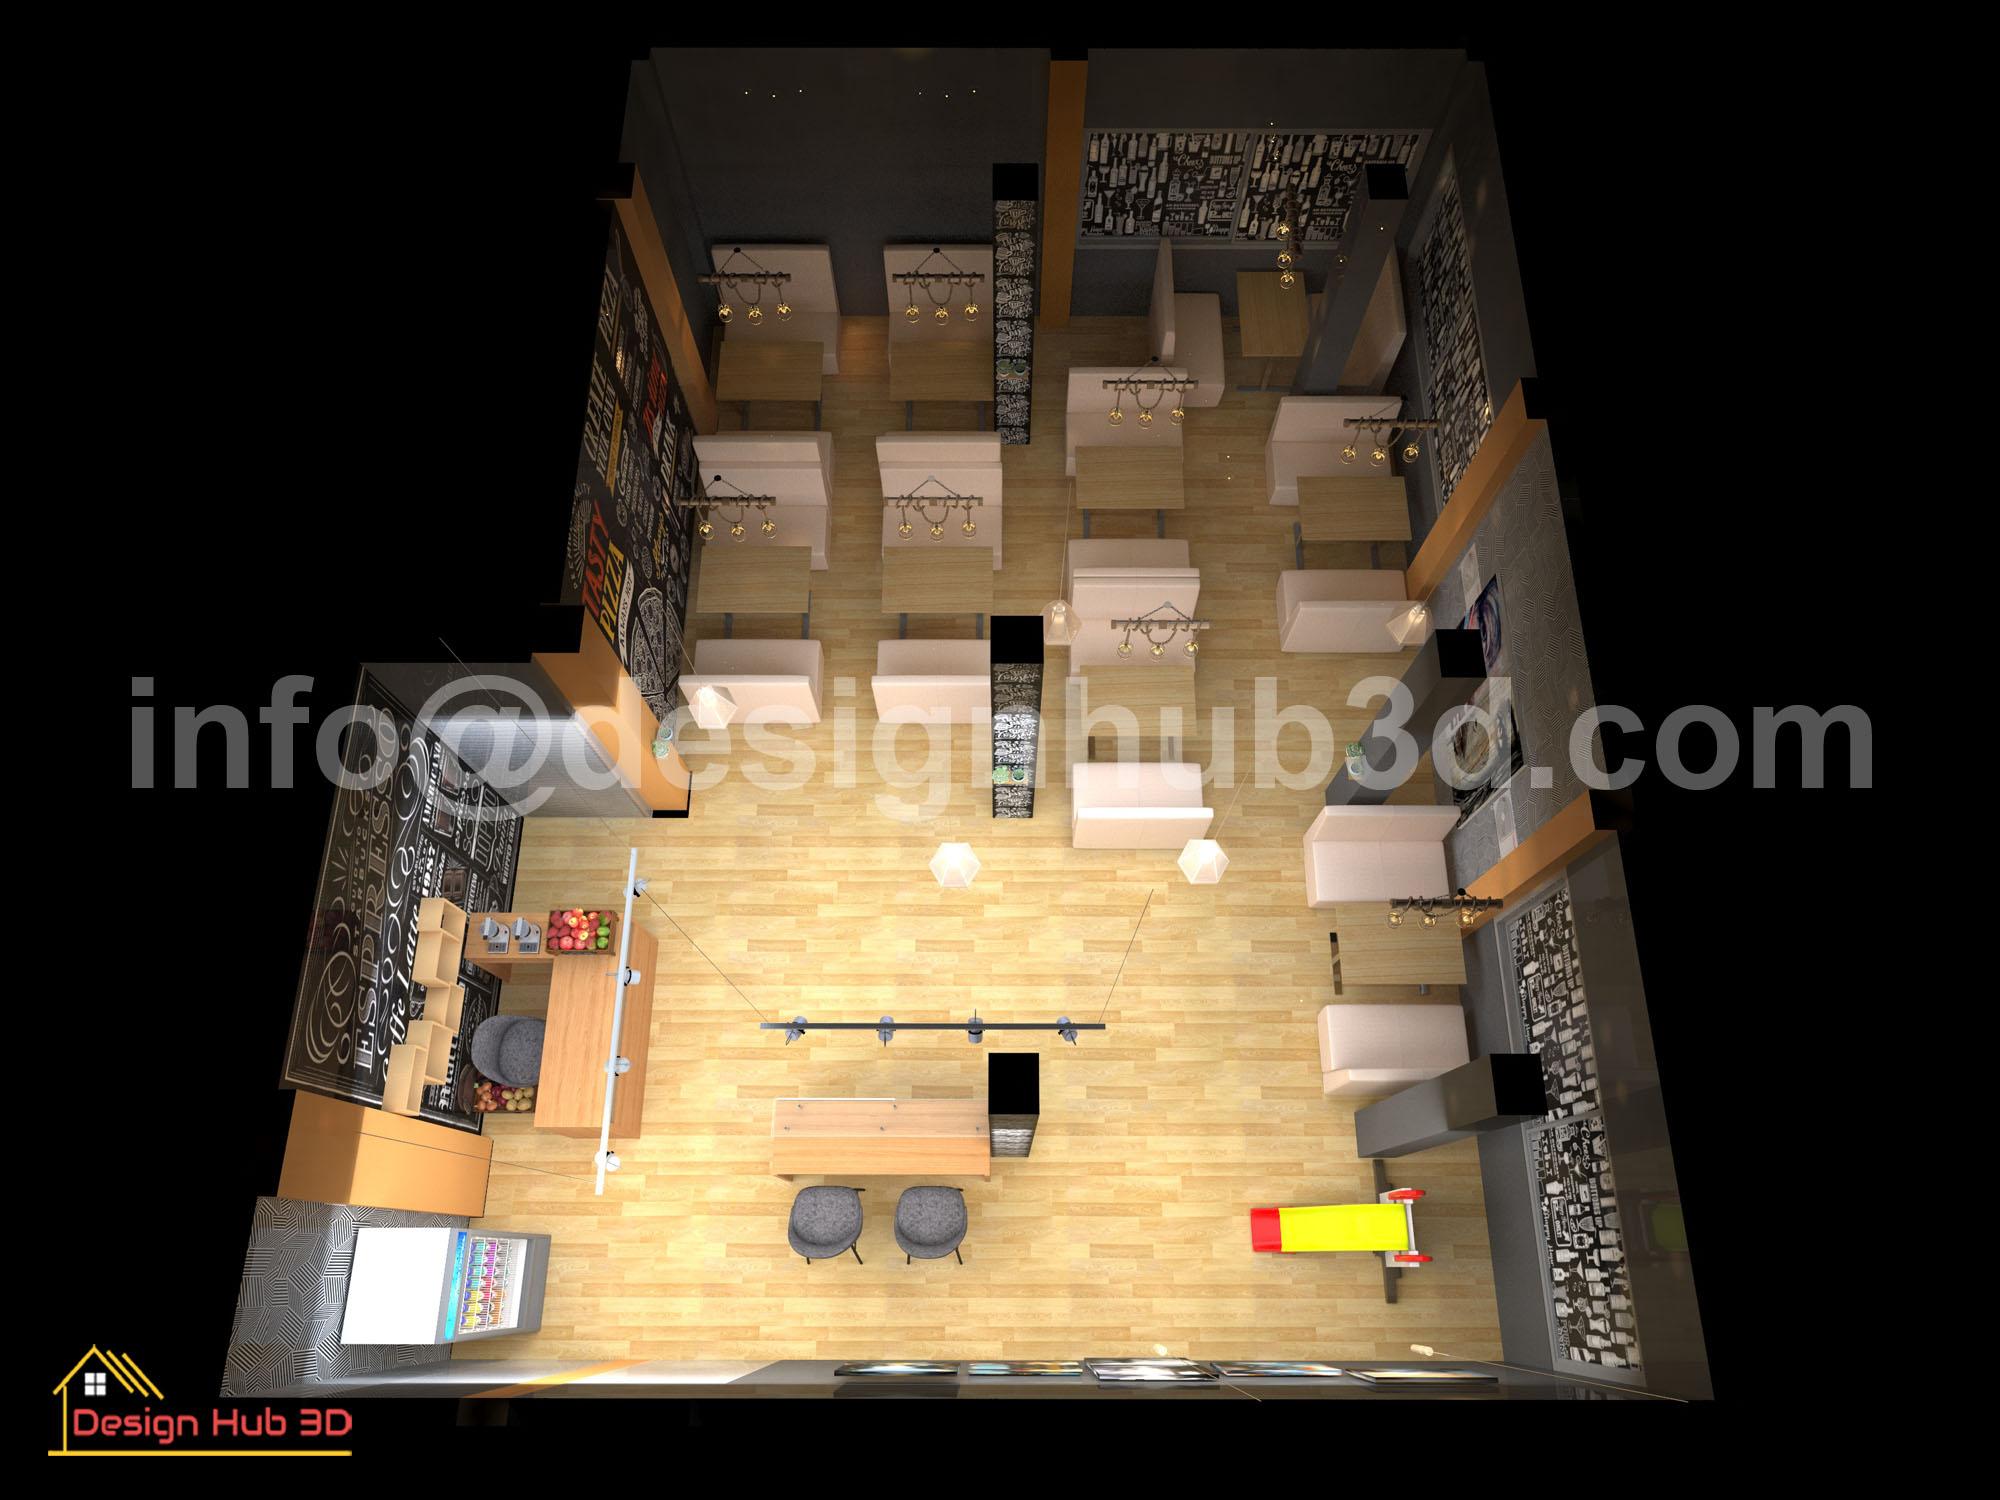 DesignHub 3D-Restaurant Top view, Restaurant interior, Restaurant Decor, Restaurant Top View